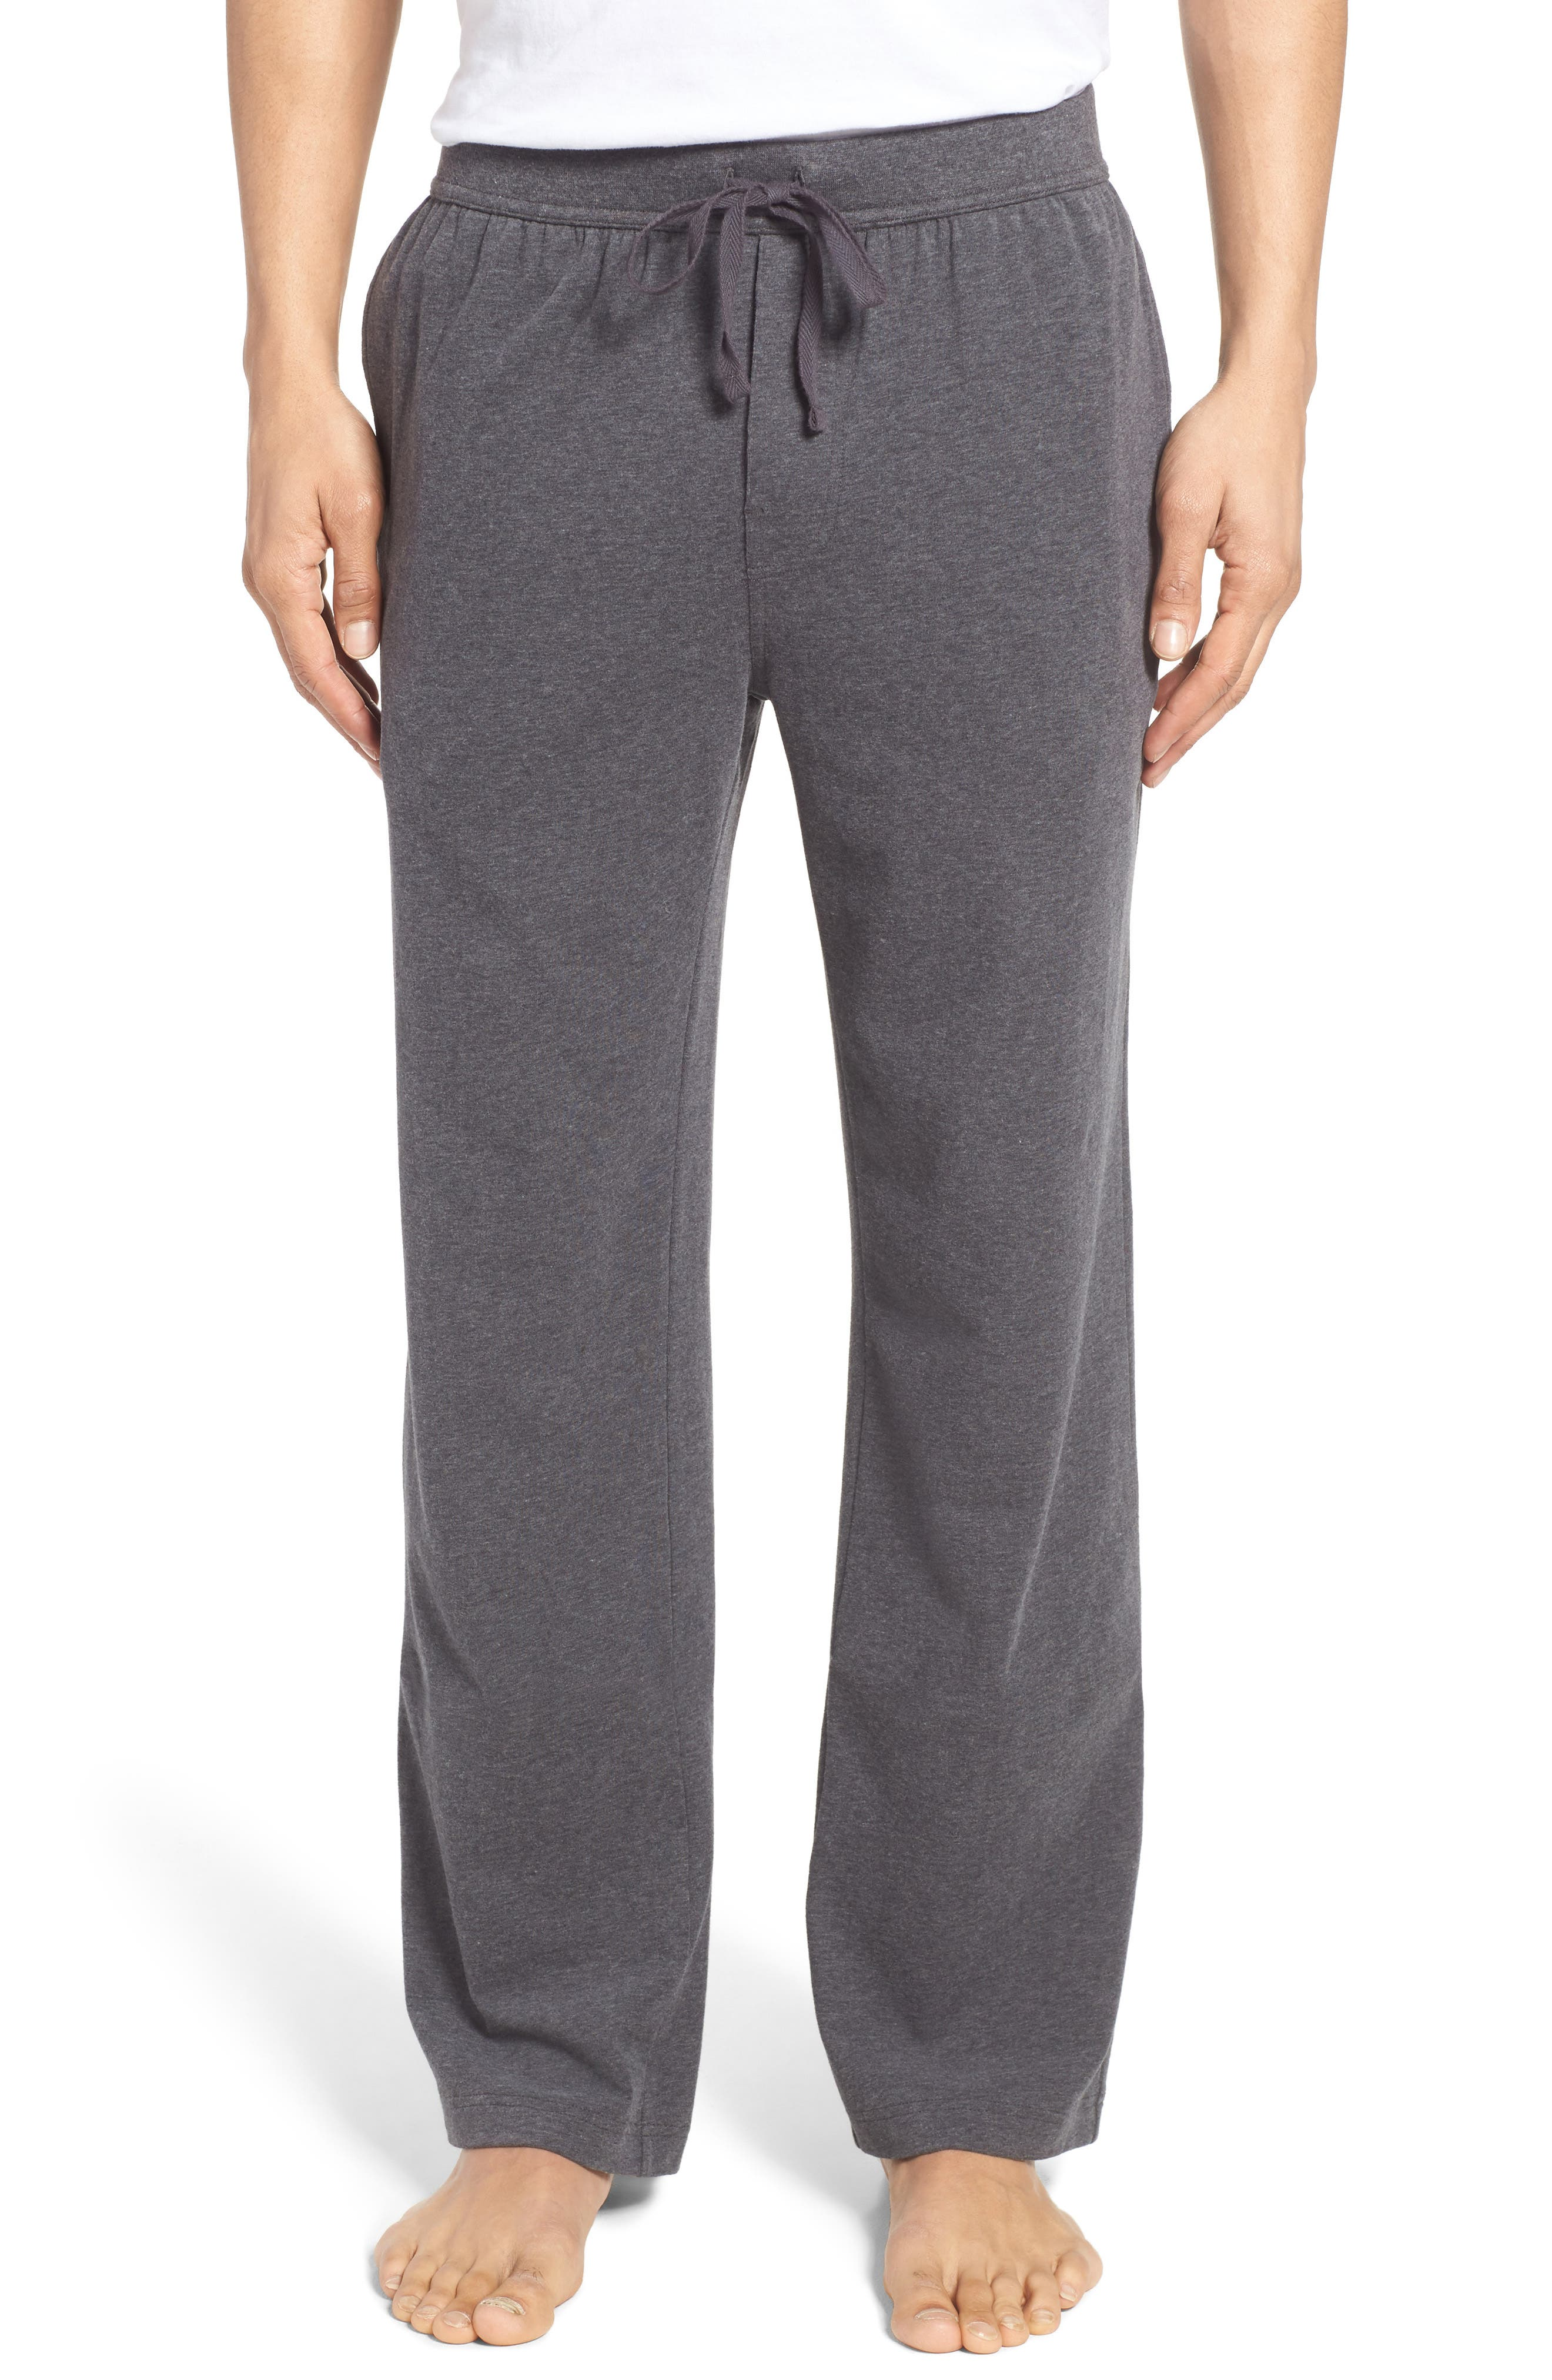 Stretch Cotton Lounge Pants,                             Main thumbnail 1, color,                             Grey Charcoal